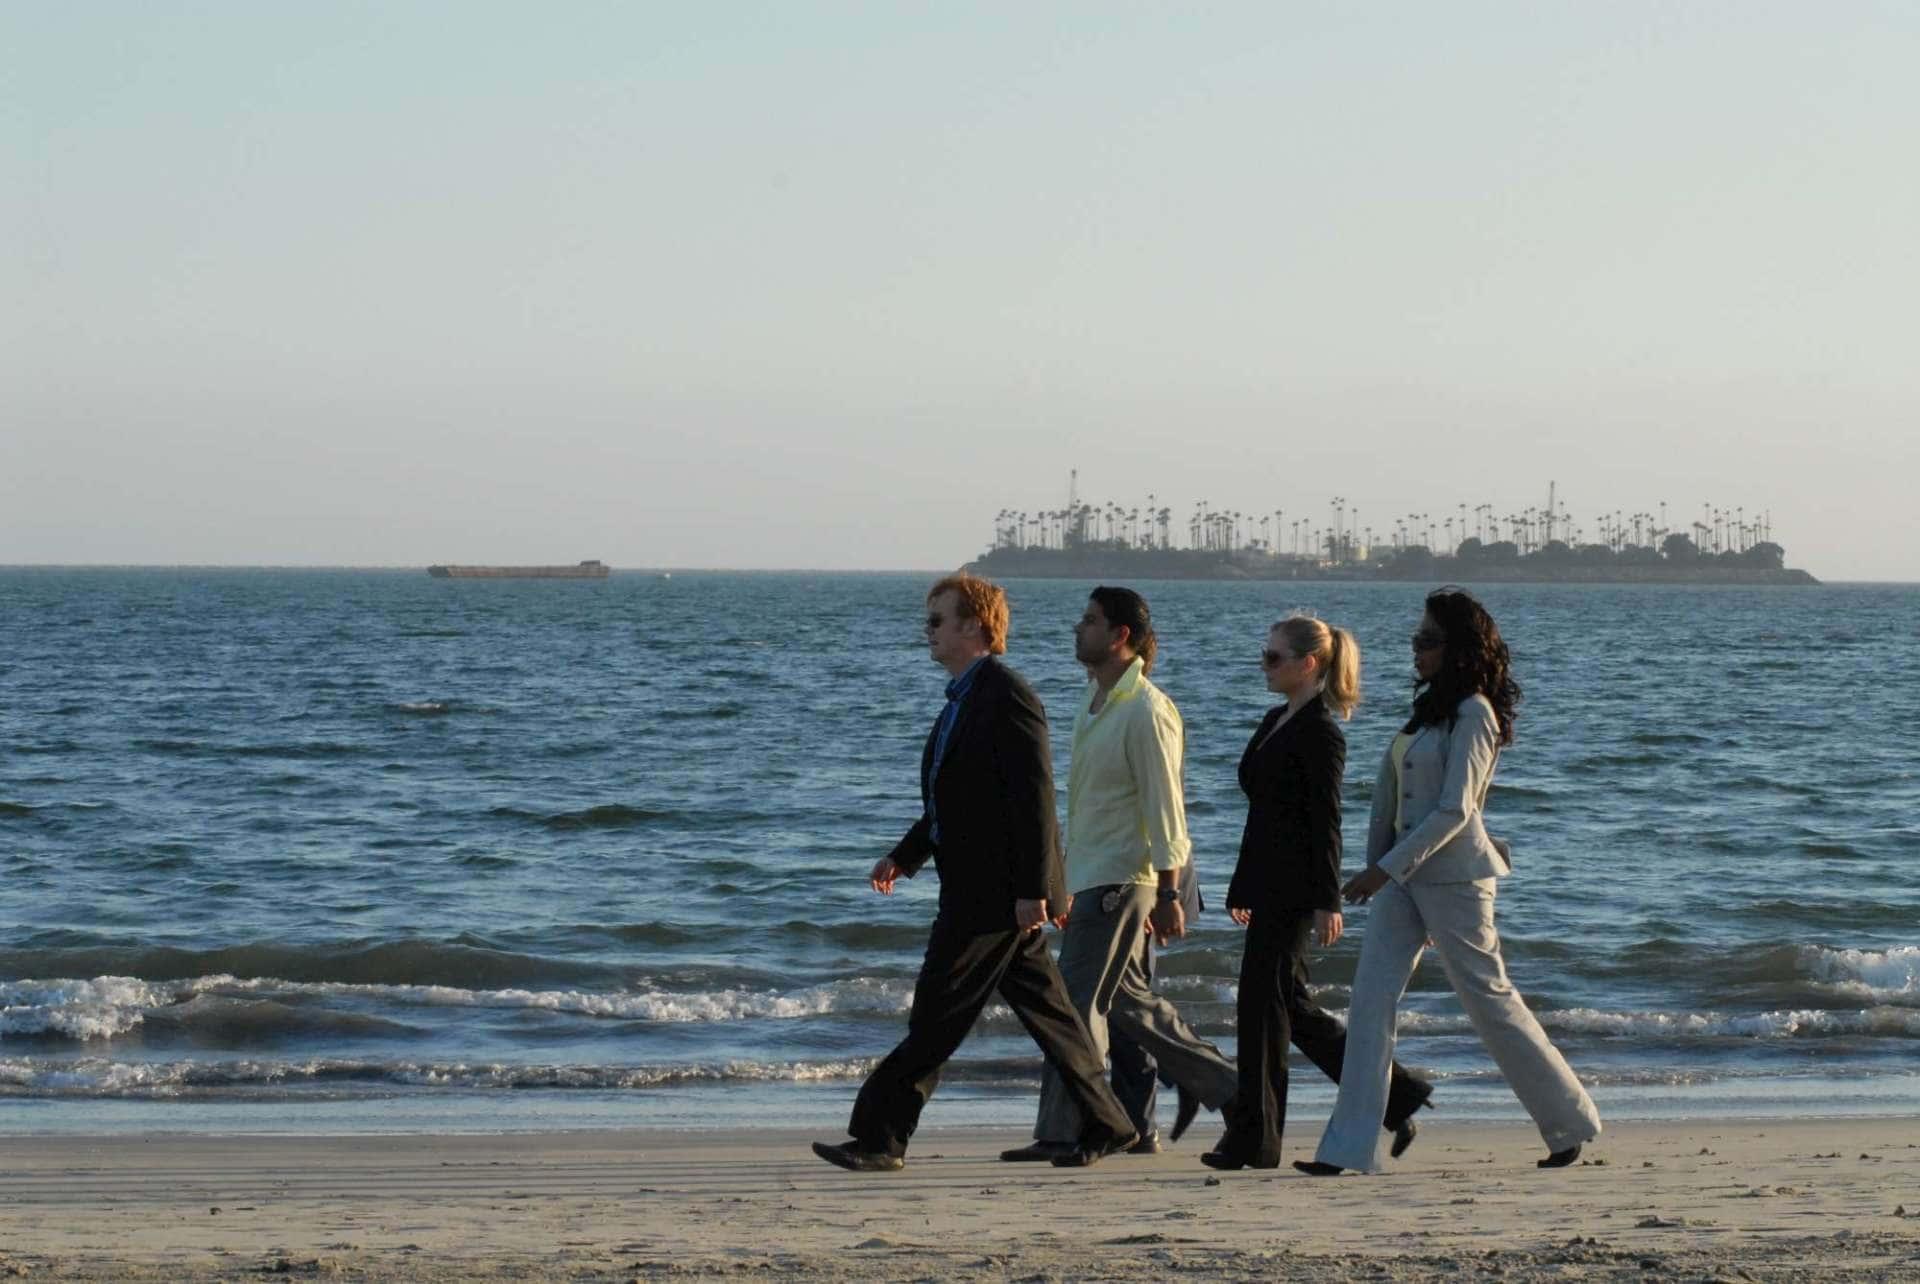 Les experts : Miami - Cible coupable